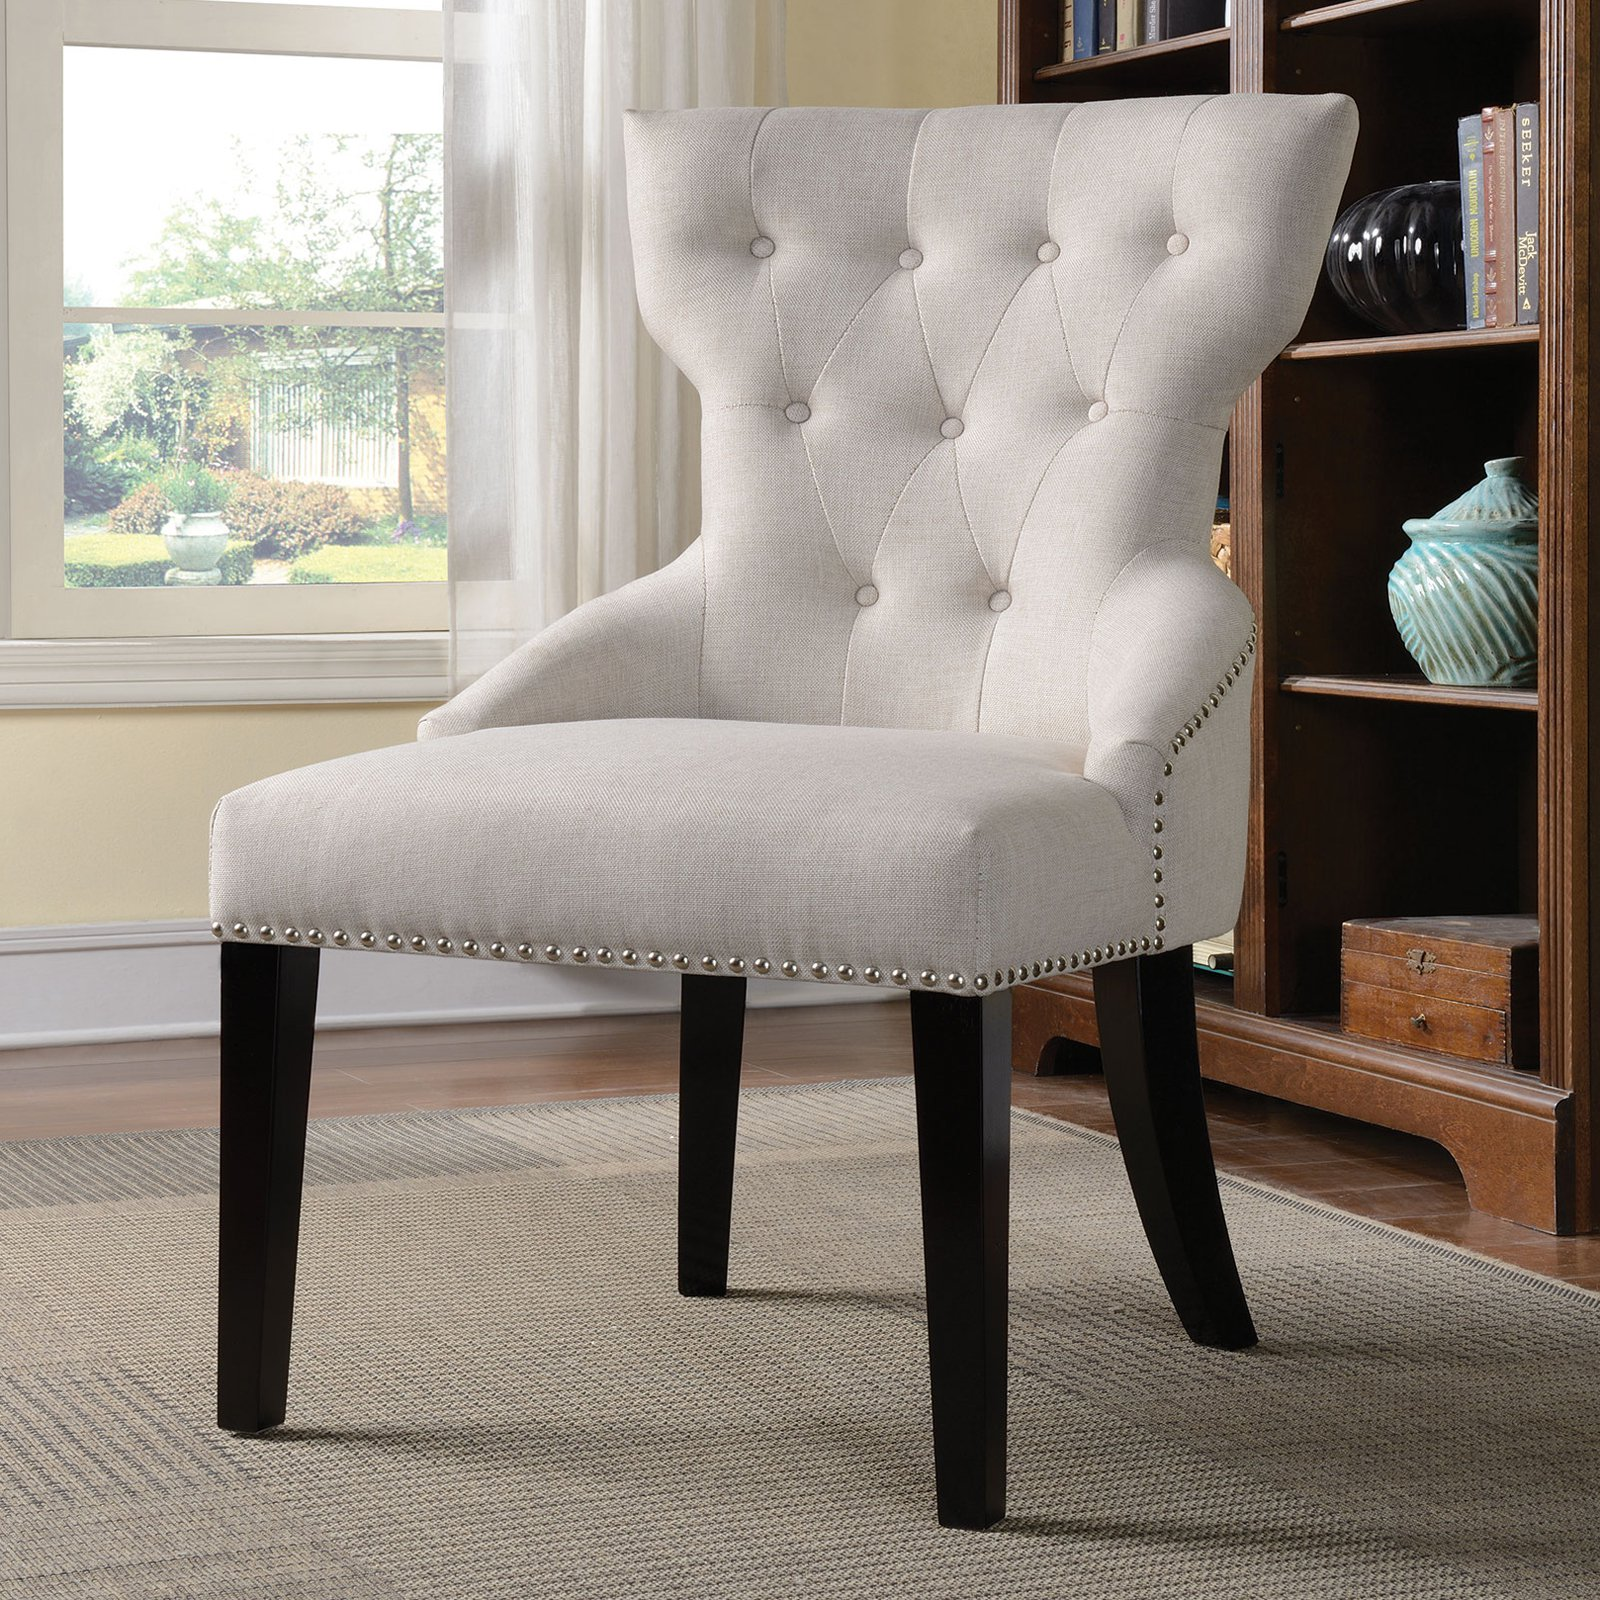 Coaster Company Traditional Accent Chair, Cream   Walmart.com